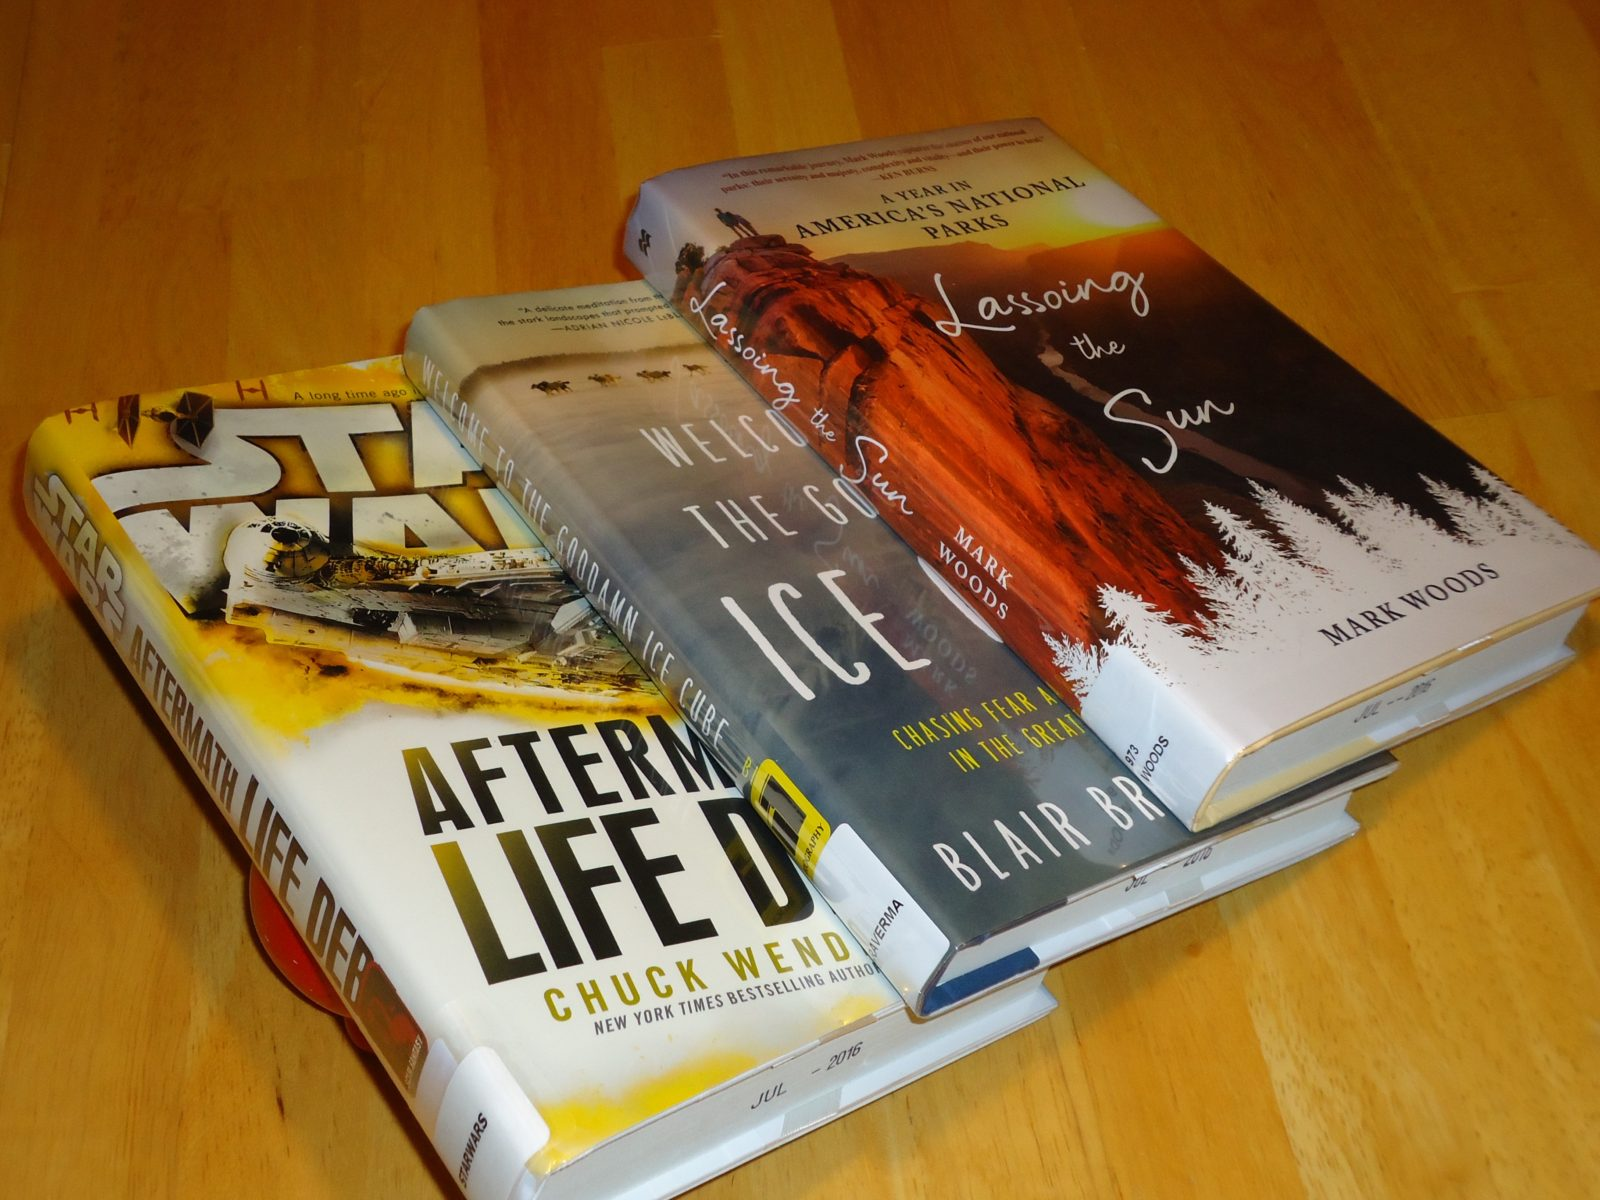 Library Haul & Reading List 07/22/16